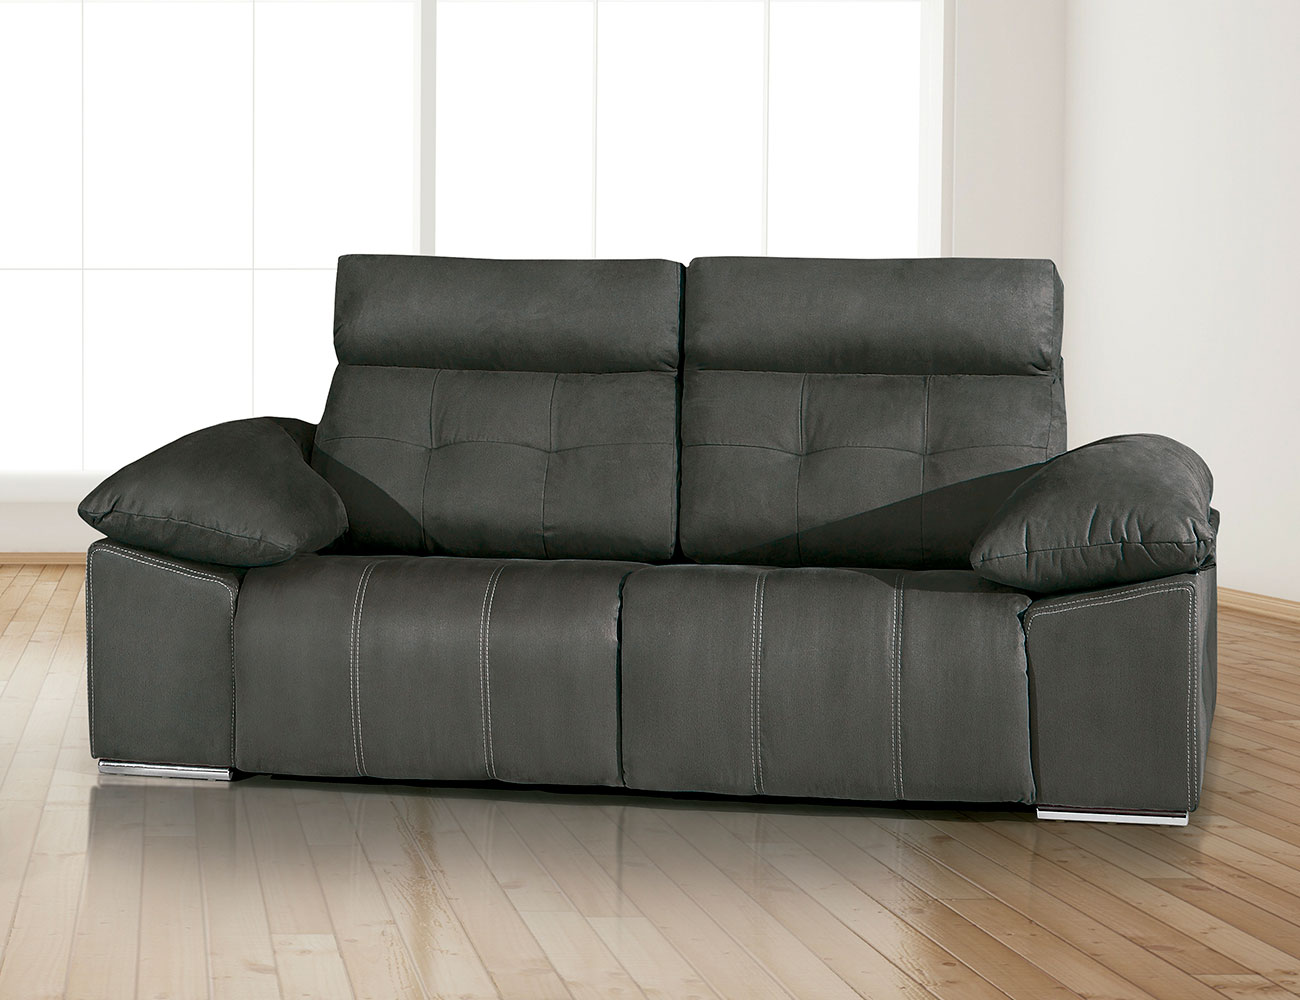 Sofa 3 plazas electrico tejido dante3